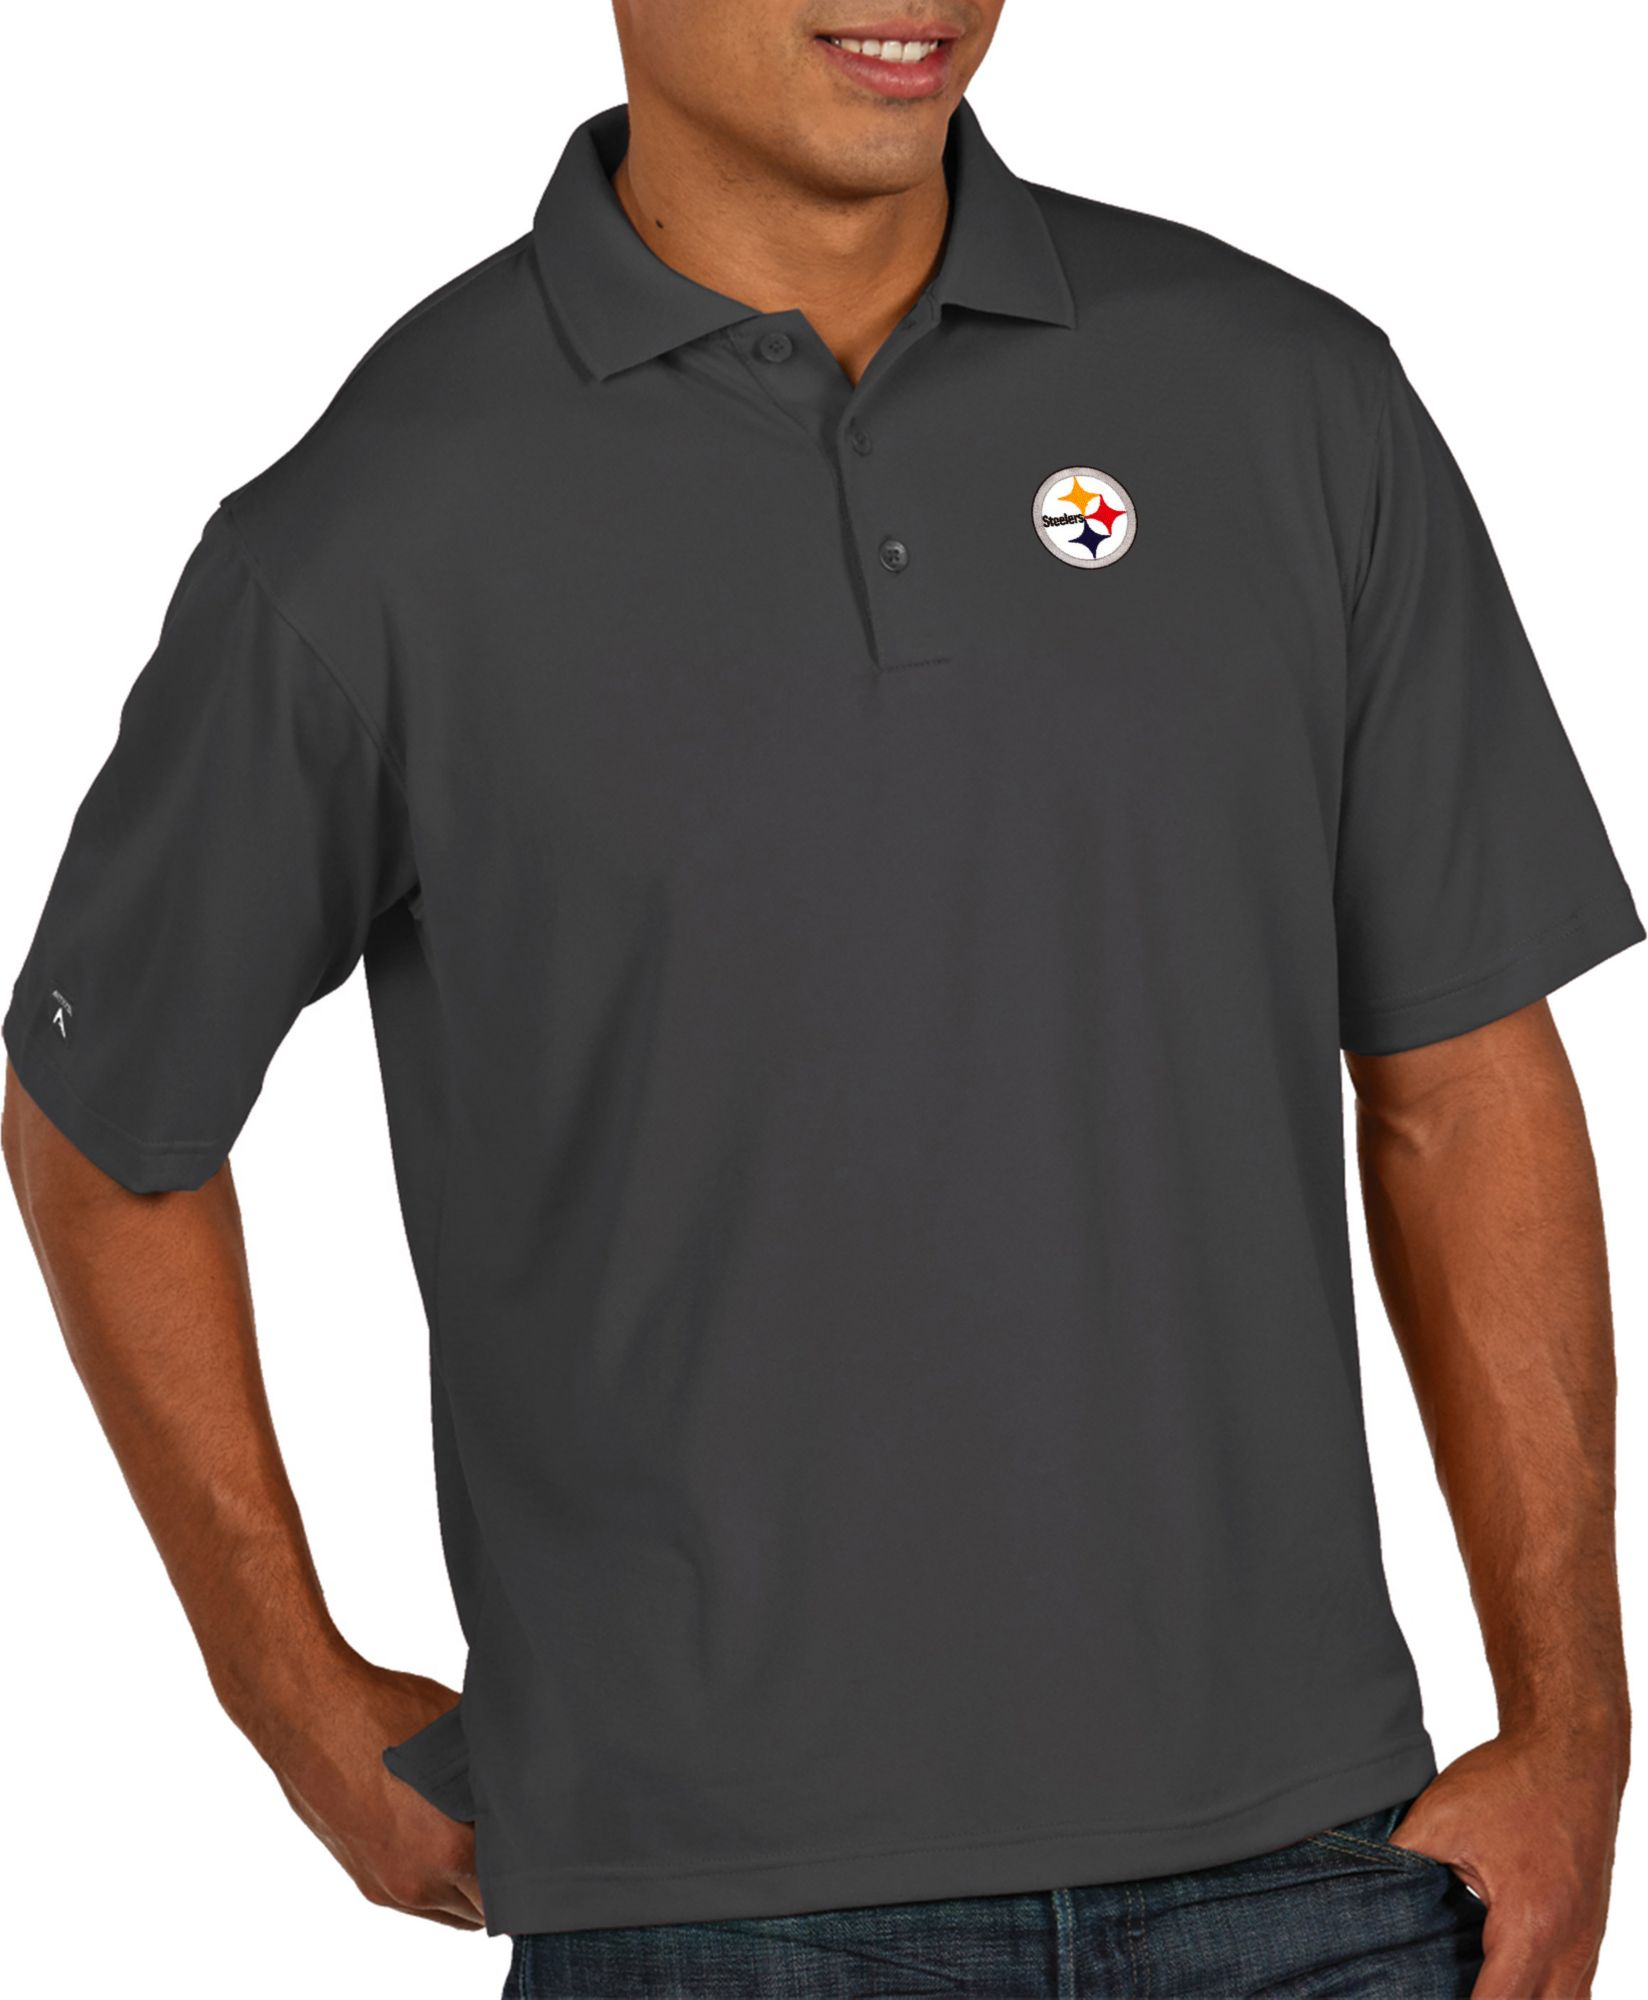 steeler polo shirts mens